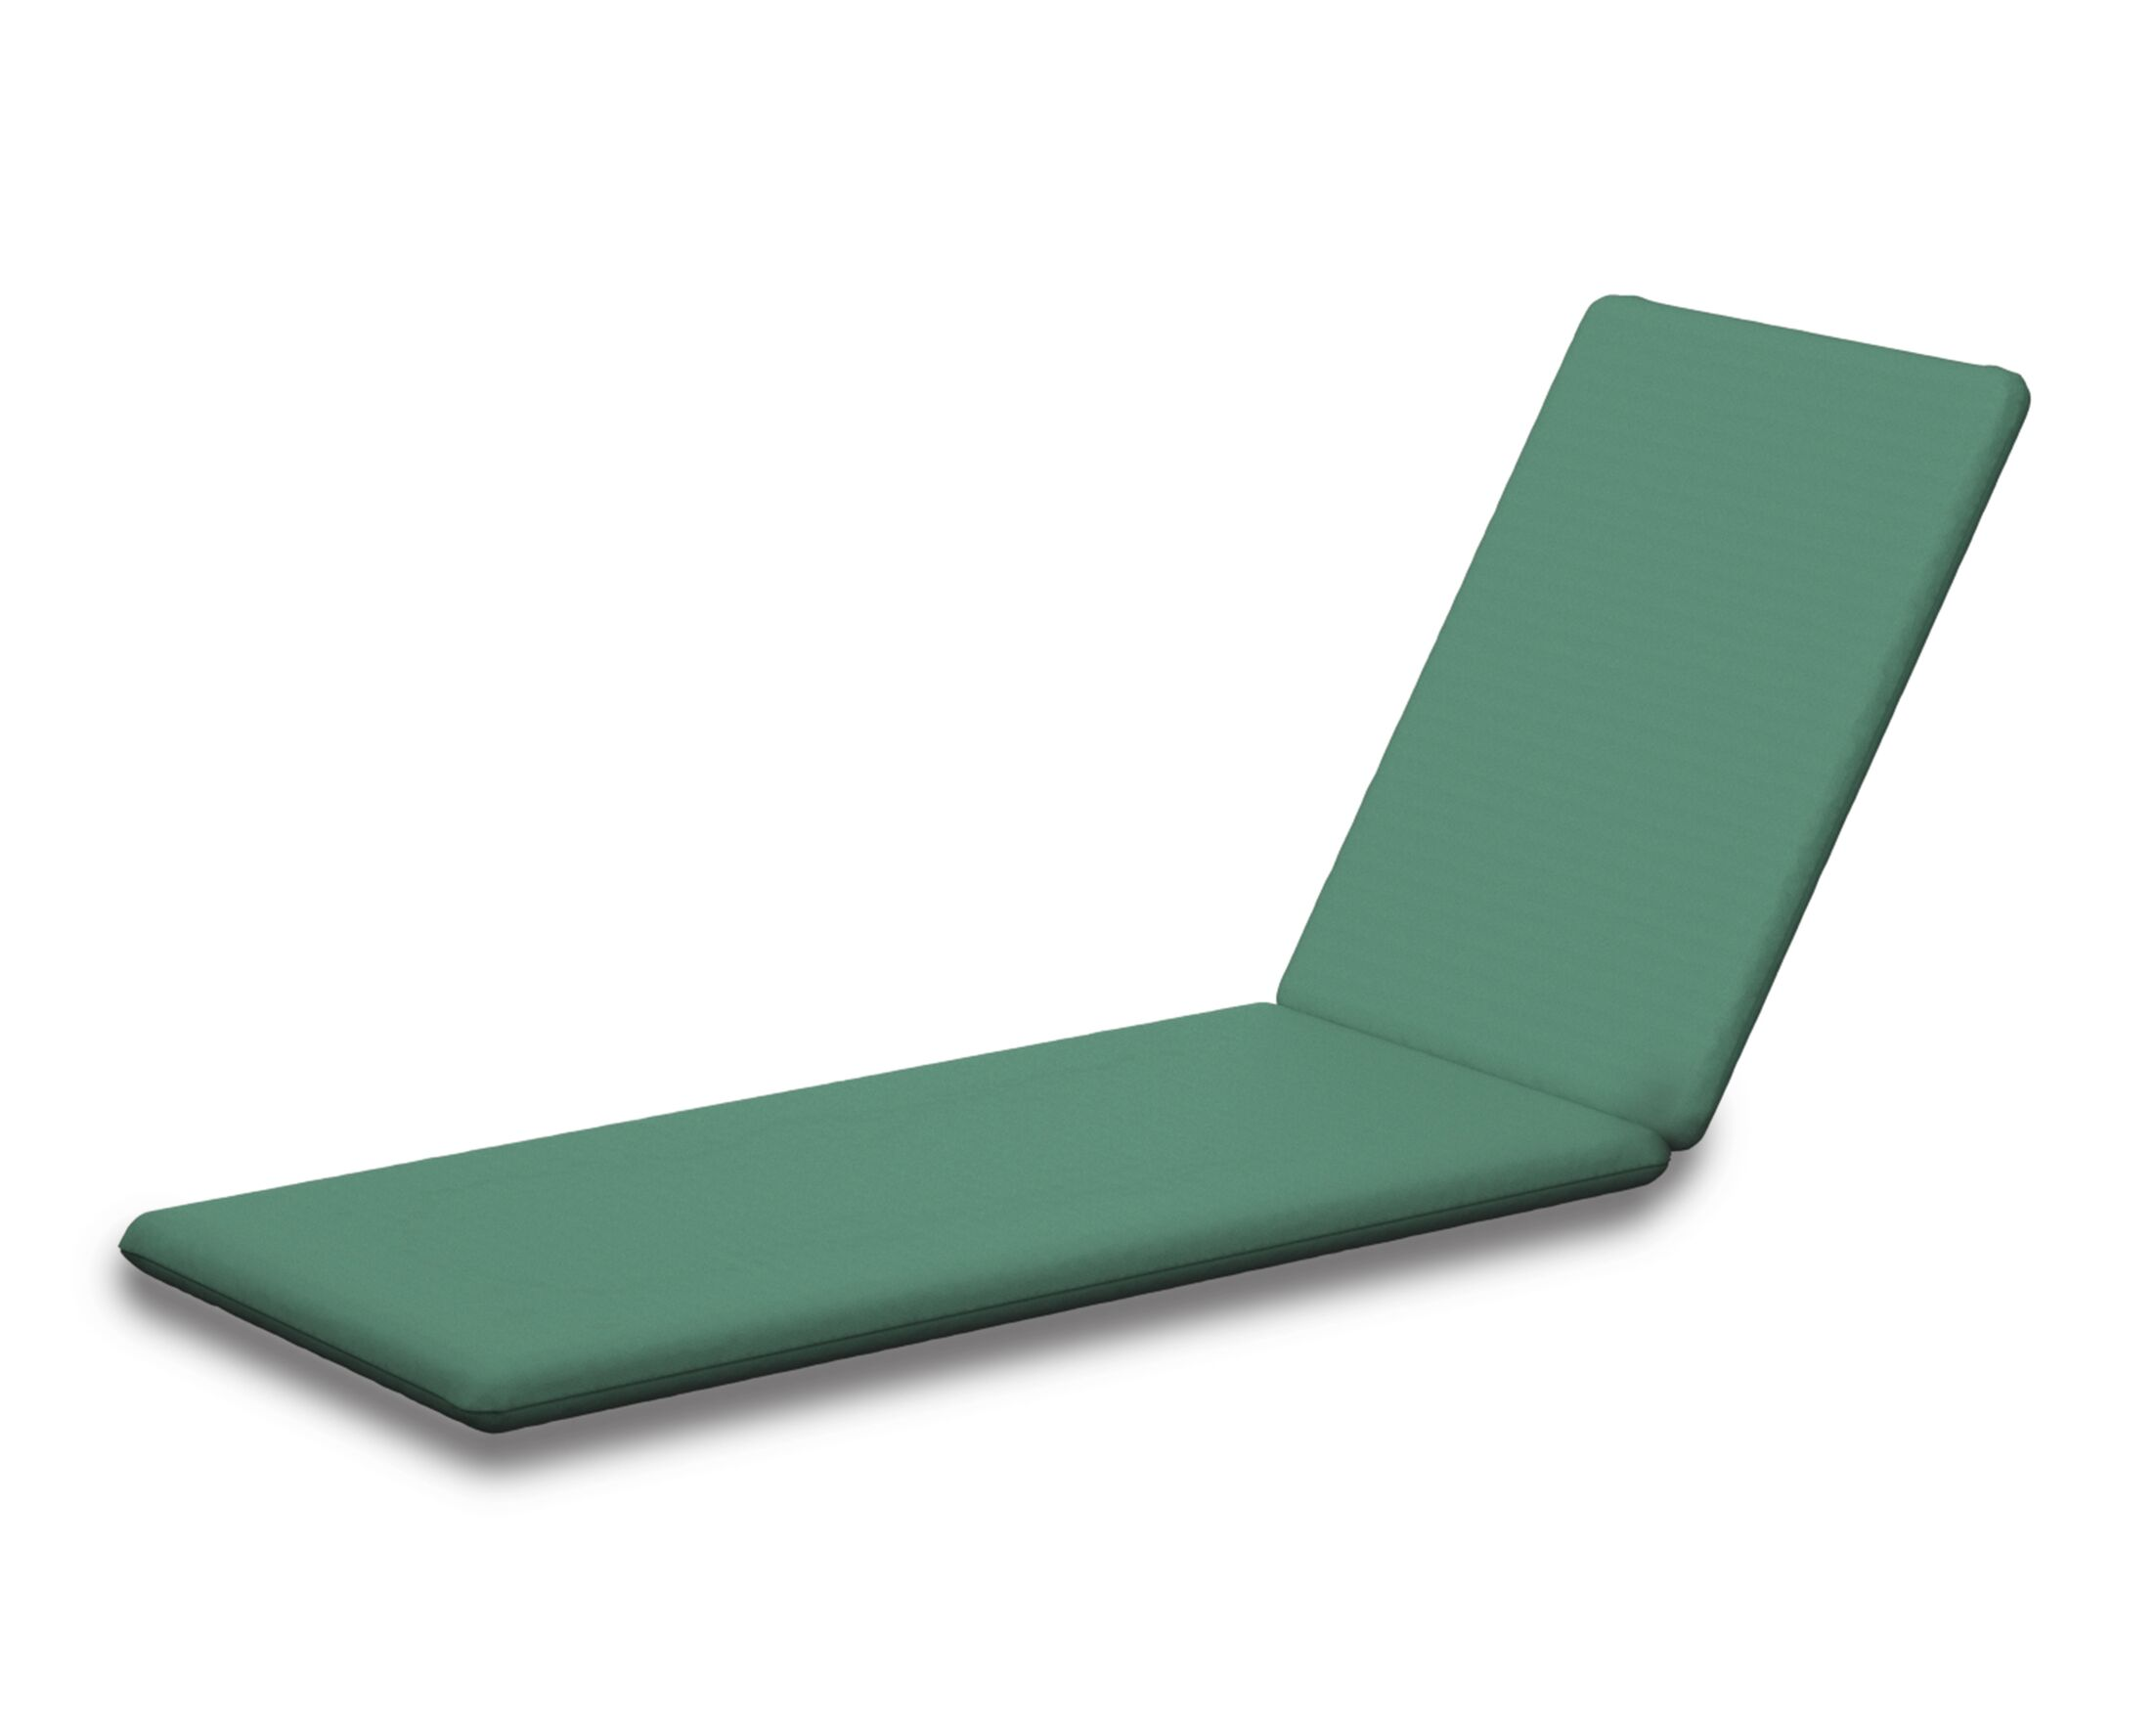 Indoor/Outdoor Sunbrella Chaise Lounge Cushion Fabric: Spa